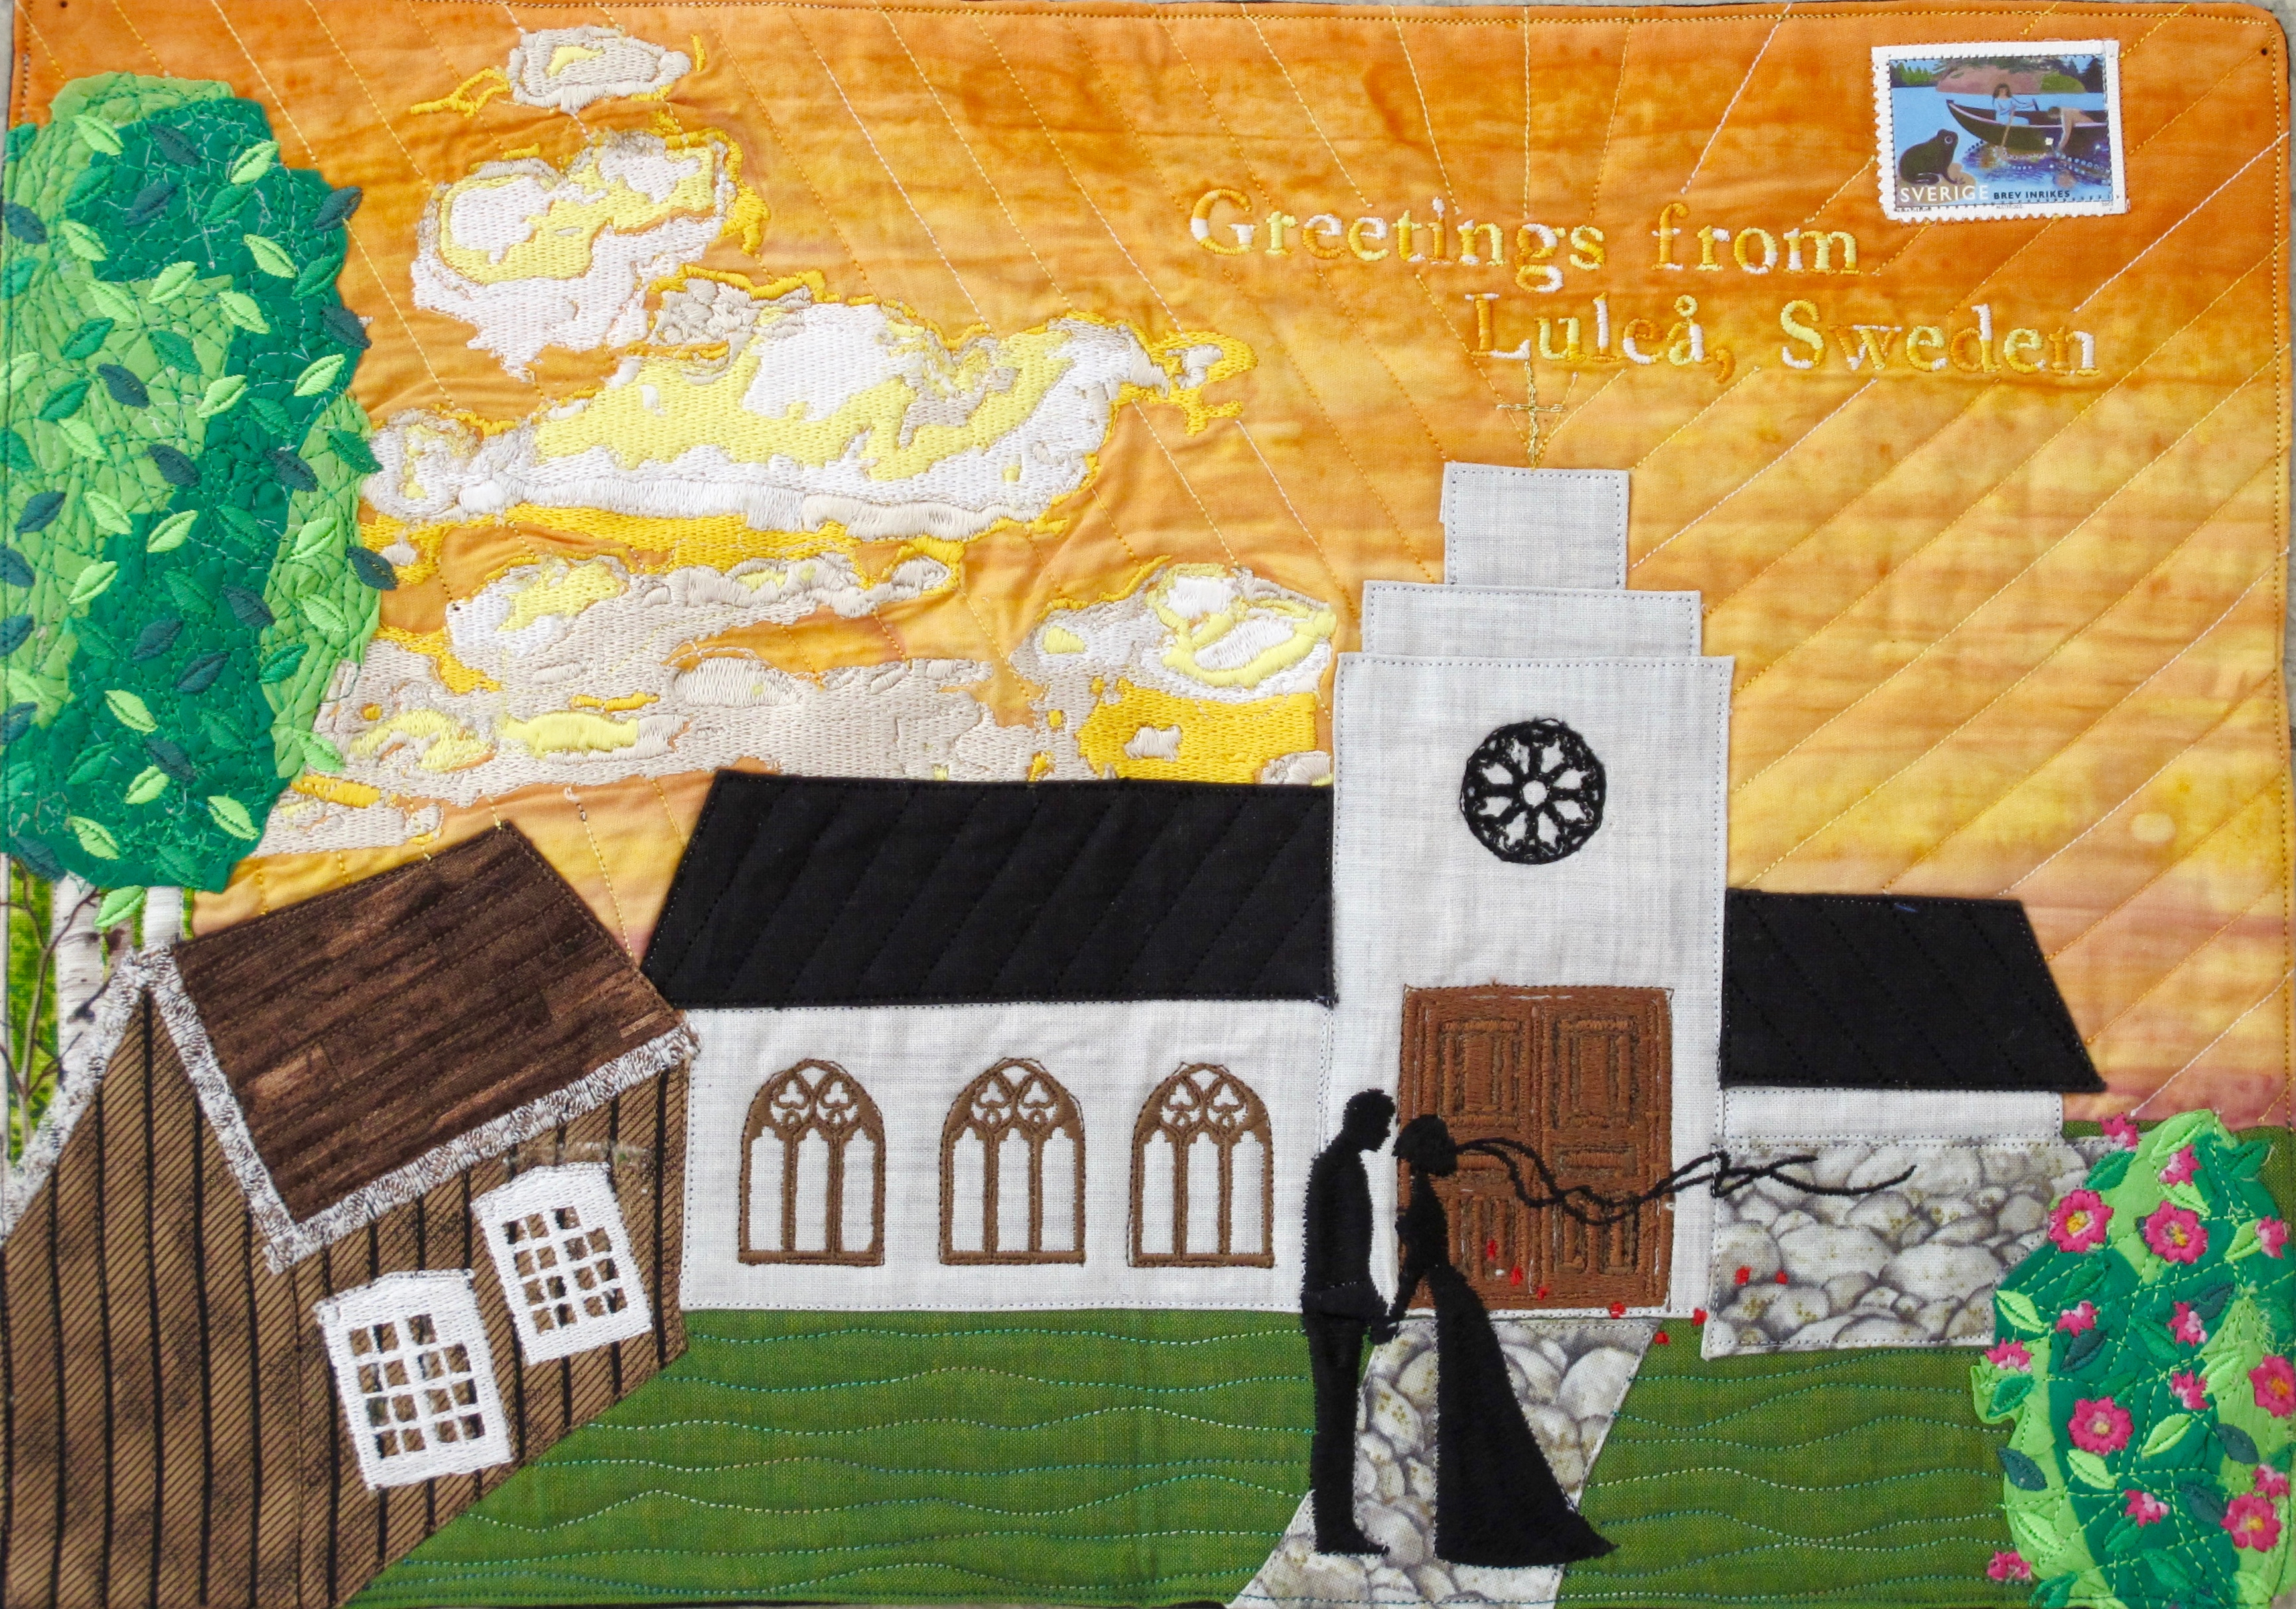 Juli Mdnattsol över kyrkbyn Sari Lahtela